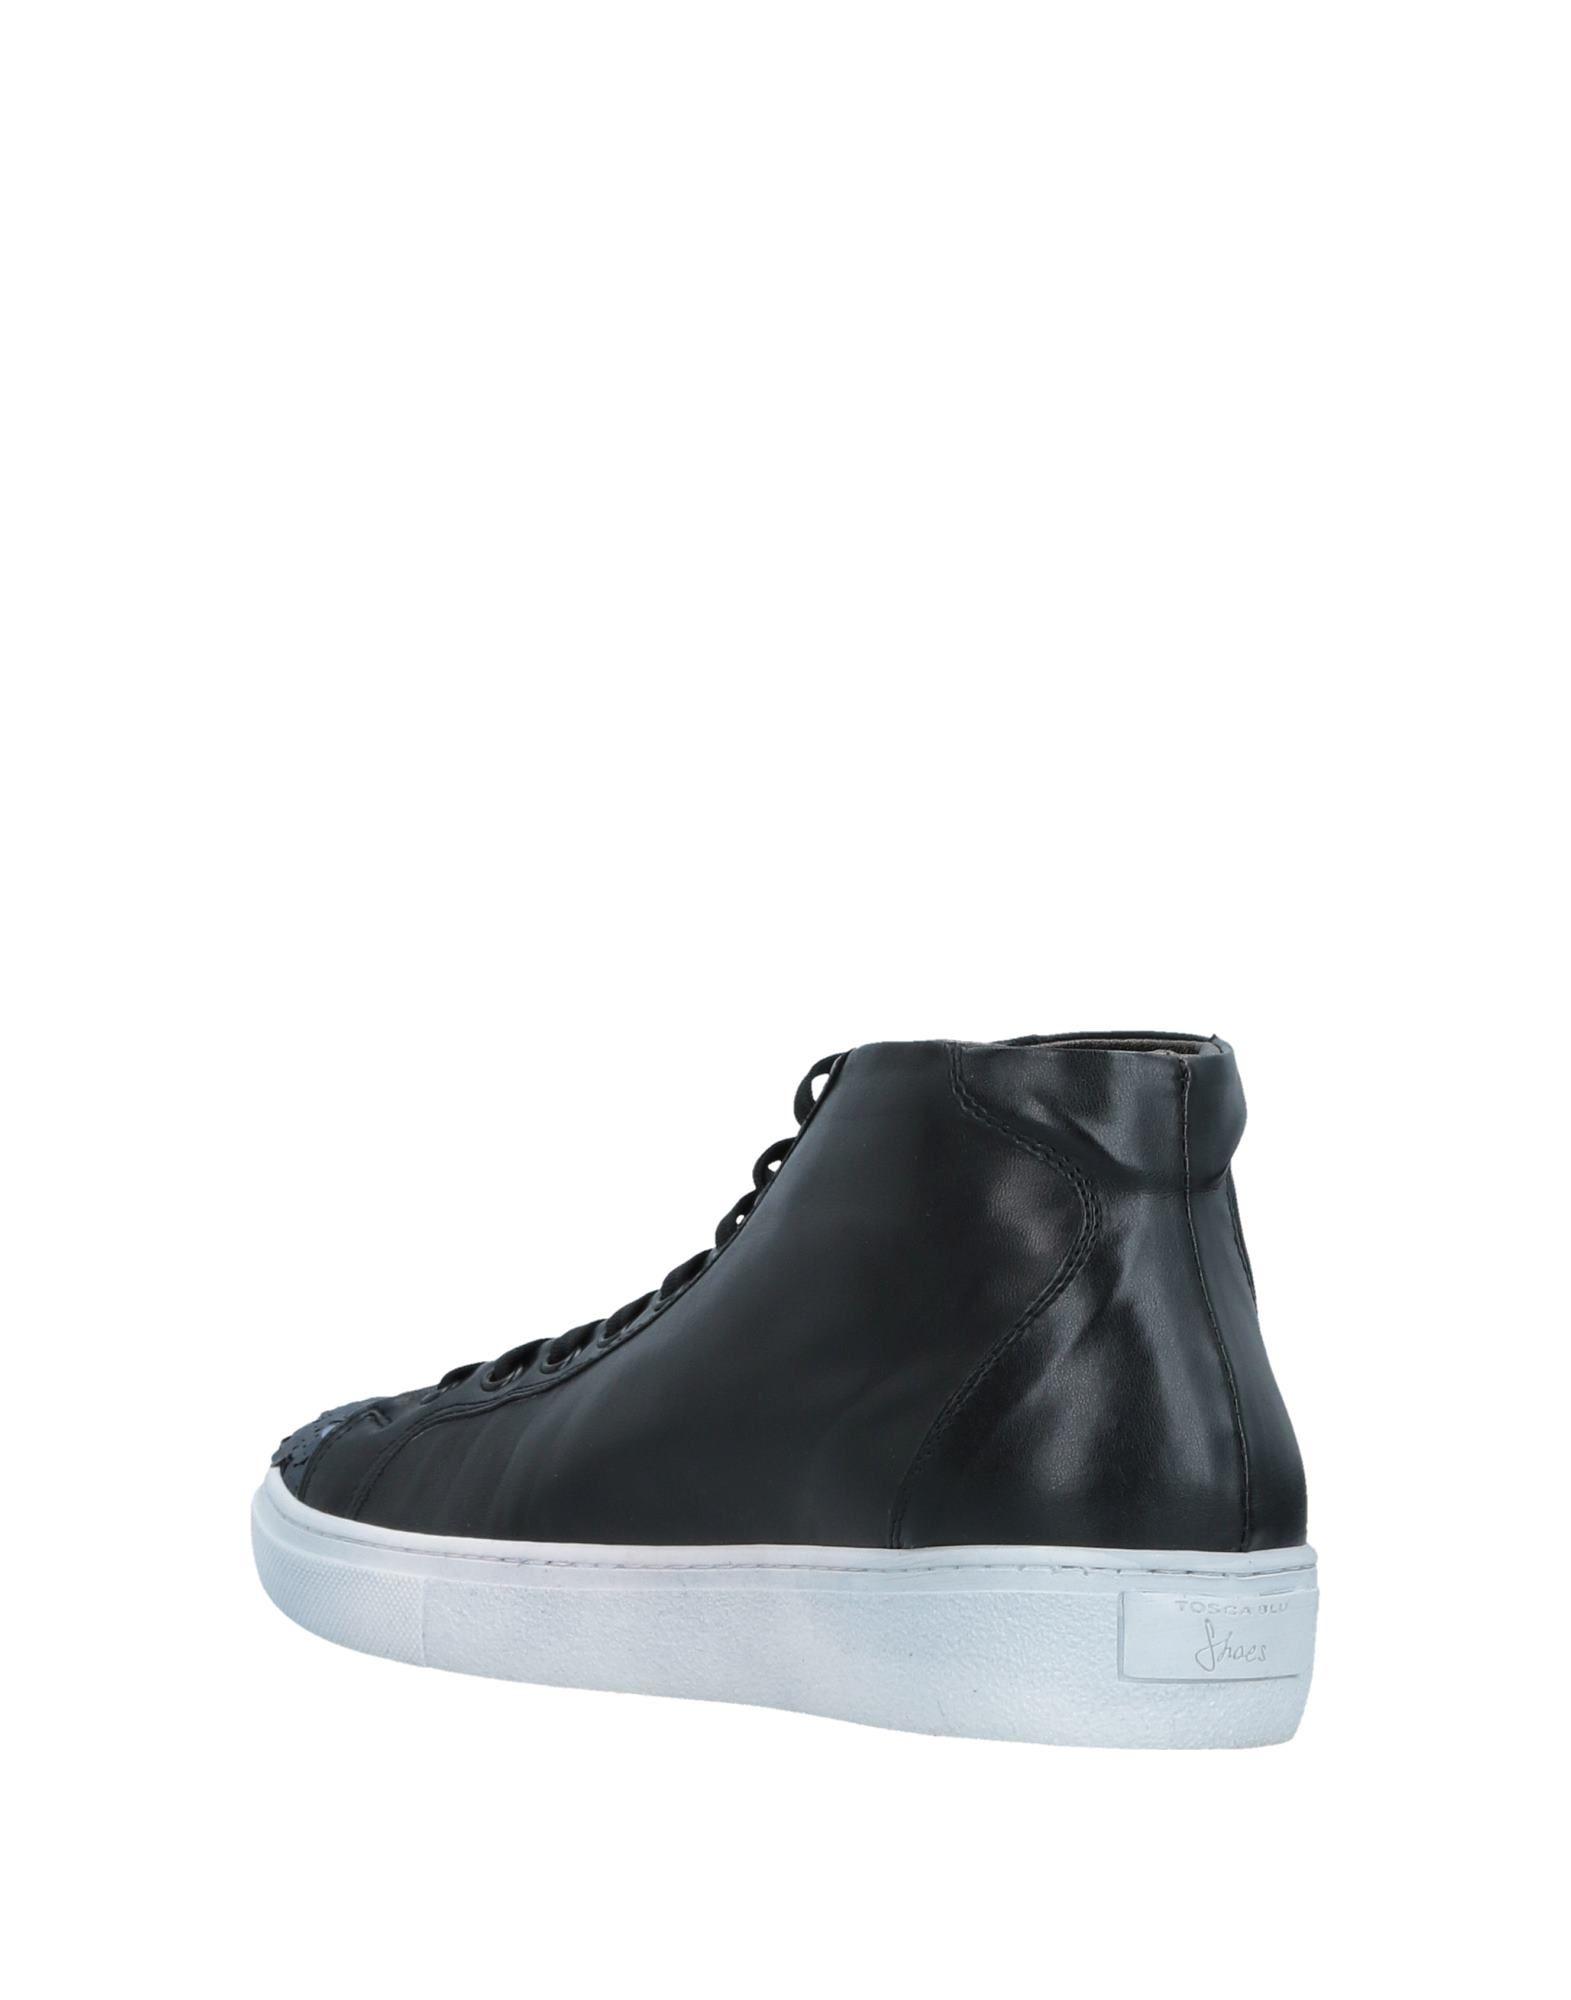 Tosca  Blu Shoes Sneakers Damen  Tosca 11455364WG Gute Qualität beliebte Schuhe 7690bb